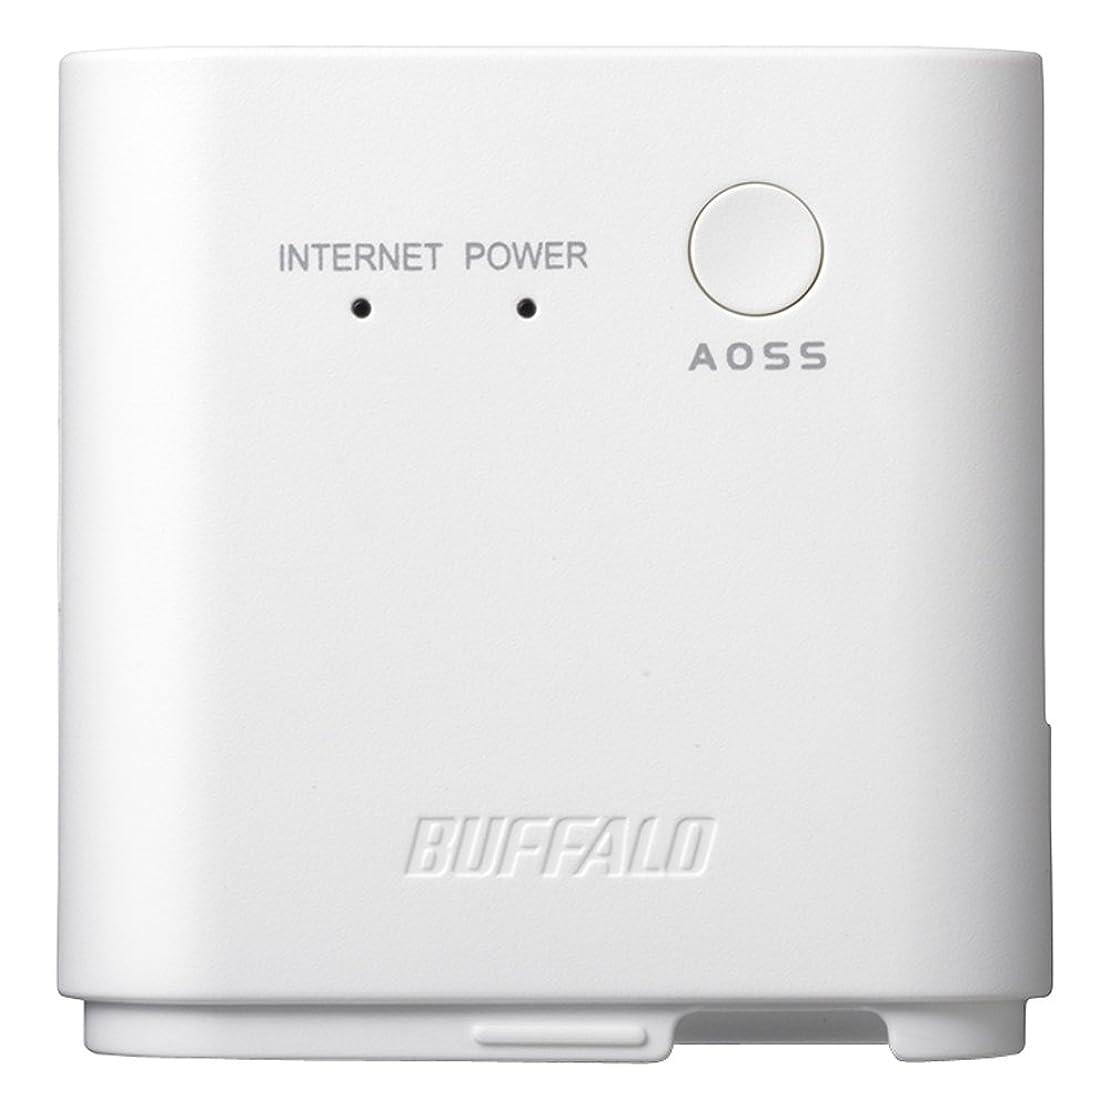 半球計画以下BUFFALO 11n/g/b 300Mbps 無線LAN親機 ホワイト WMR-300/S-WH